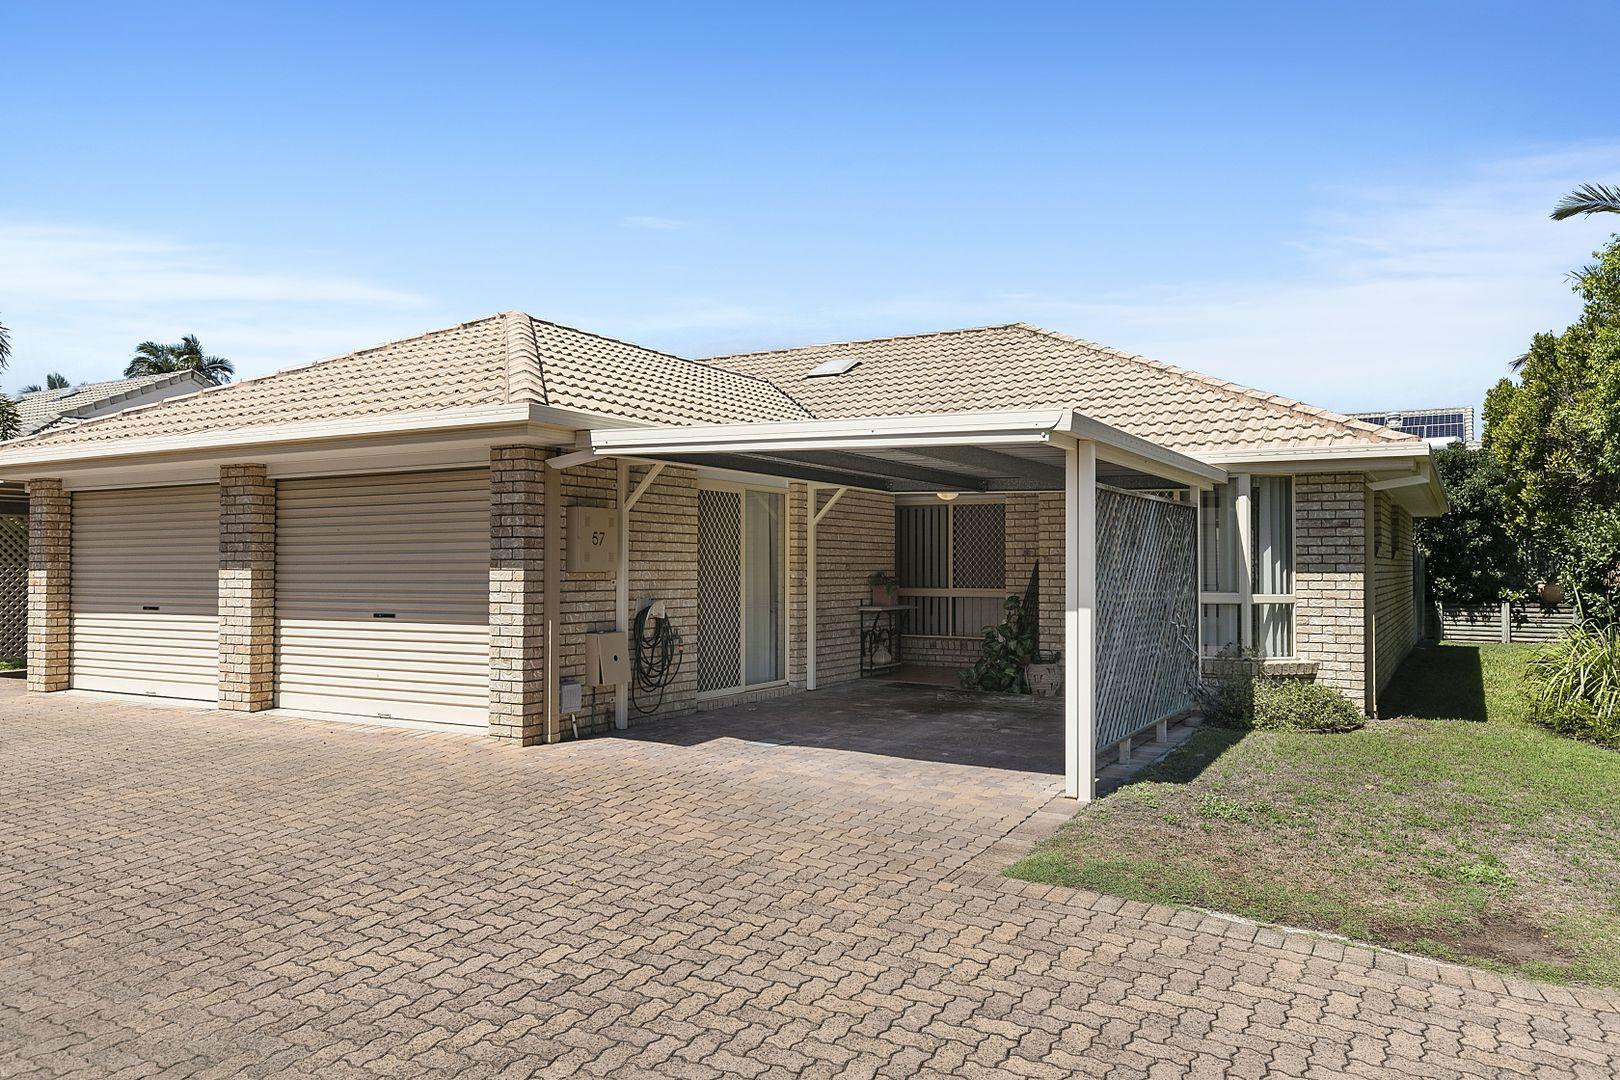 57/100 Meadowlands Road, Carina QLD 4152, Image 1